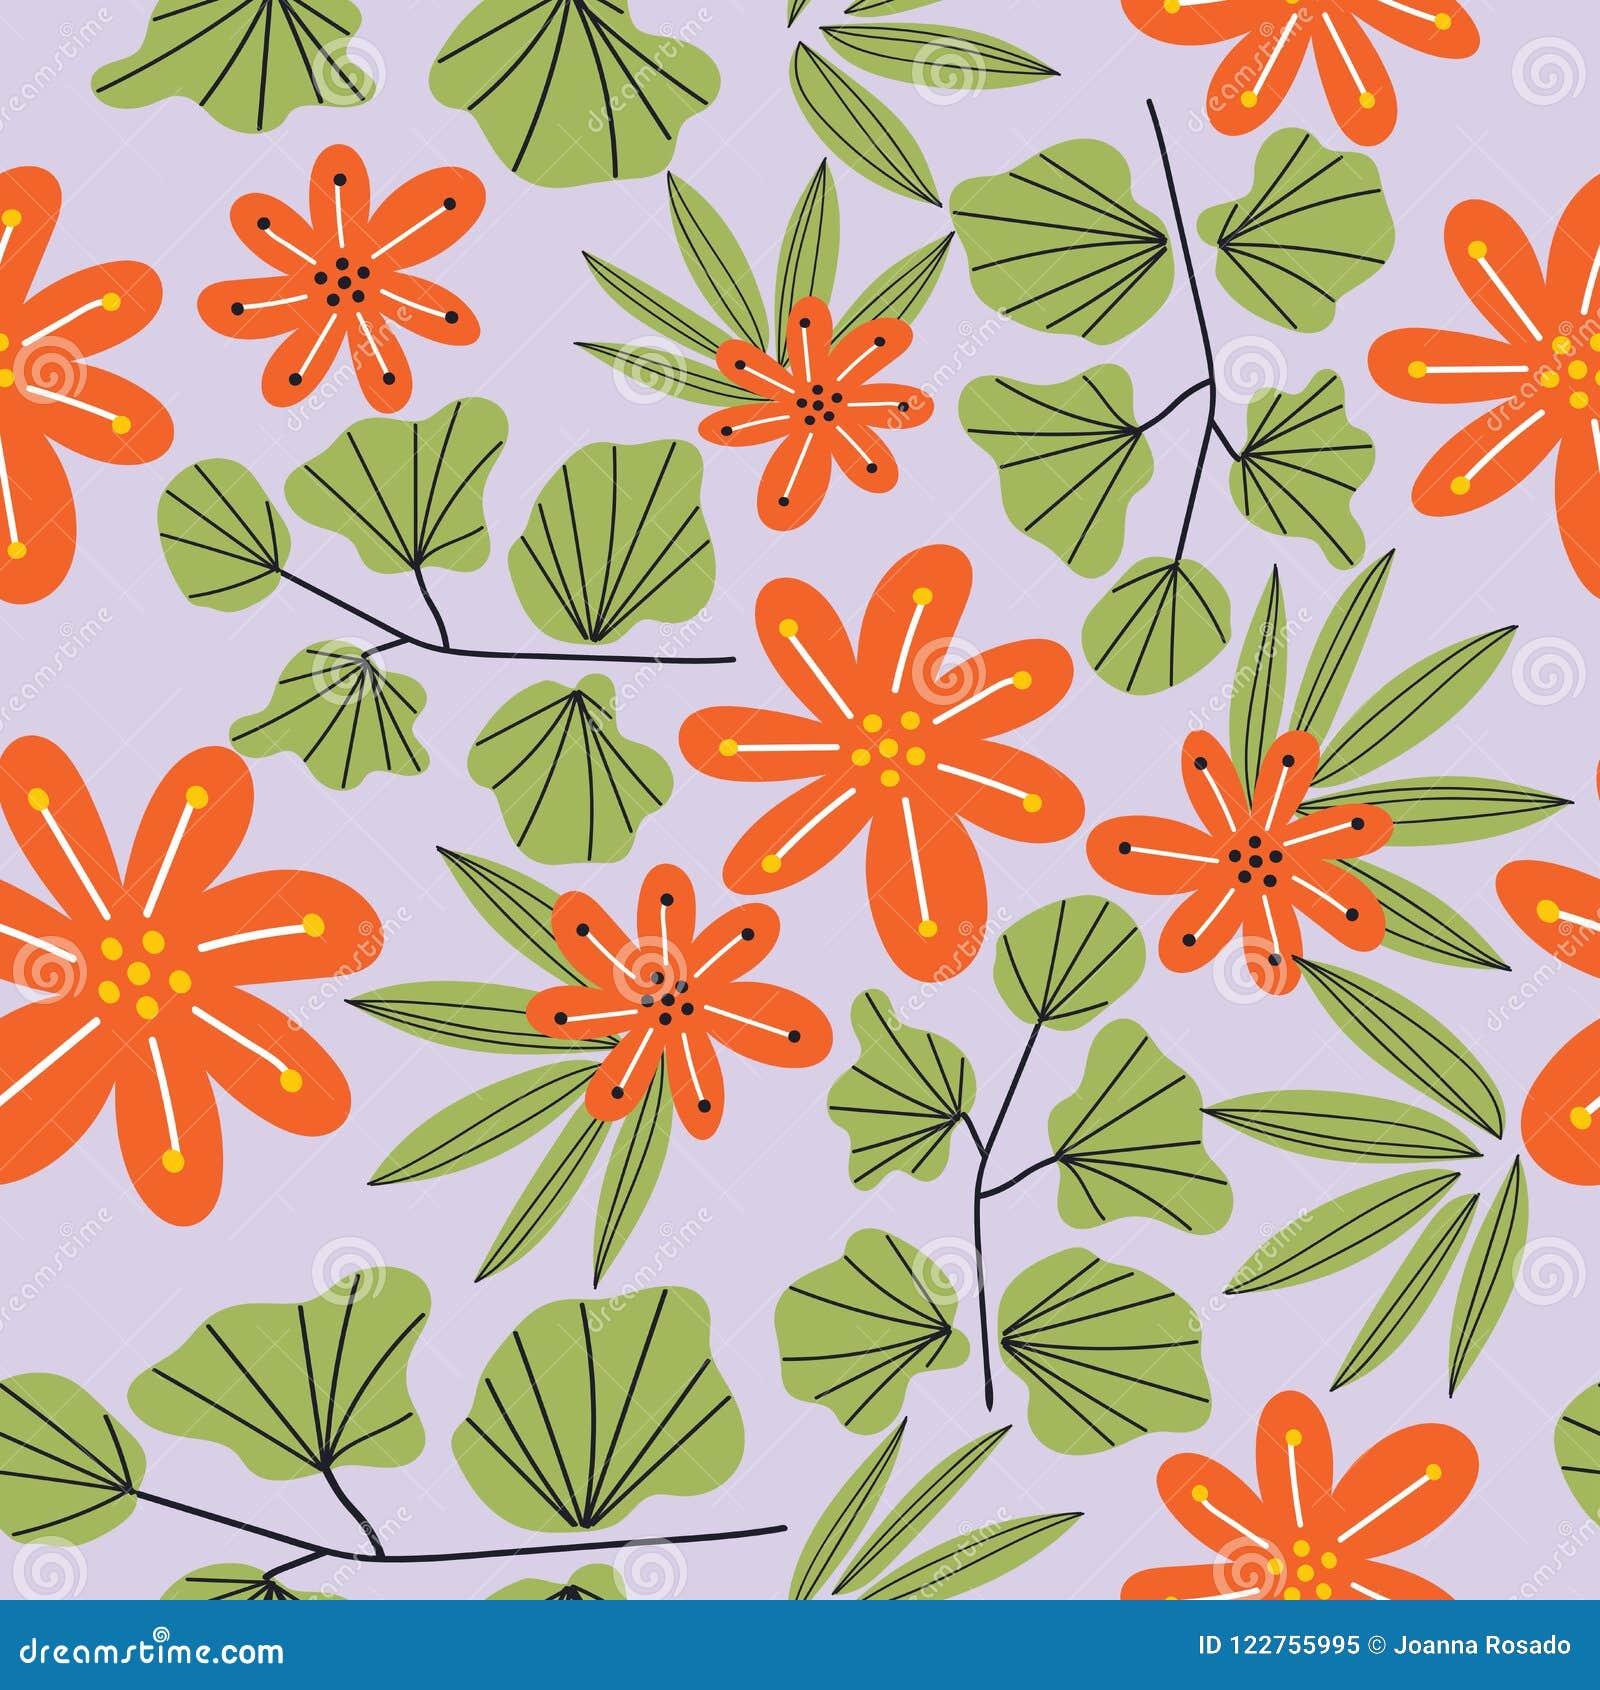 Vector Floral Print